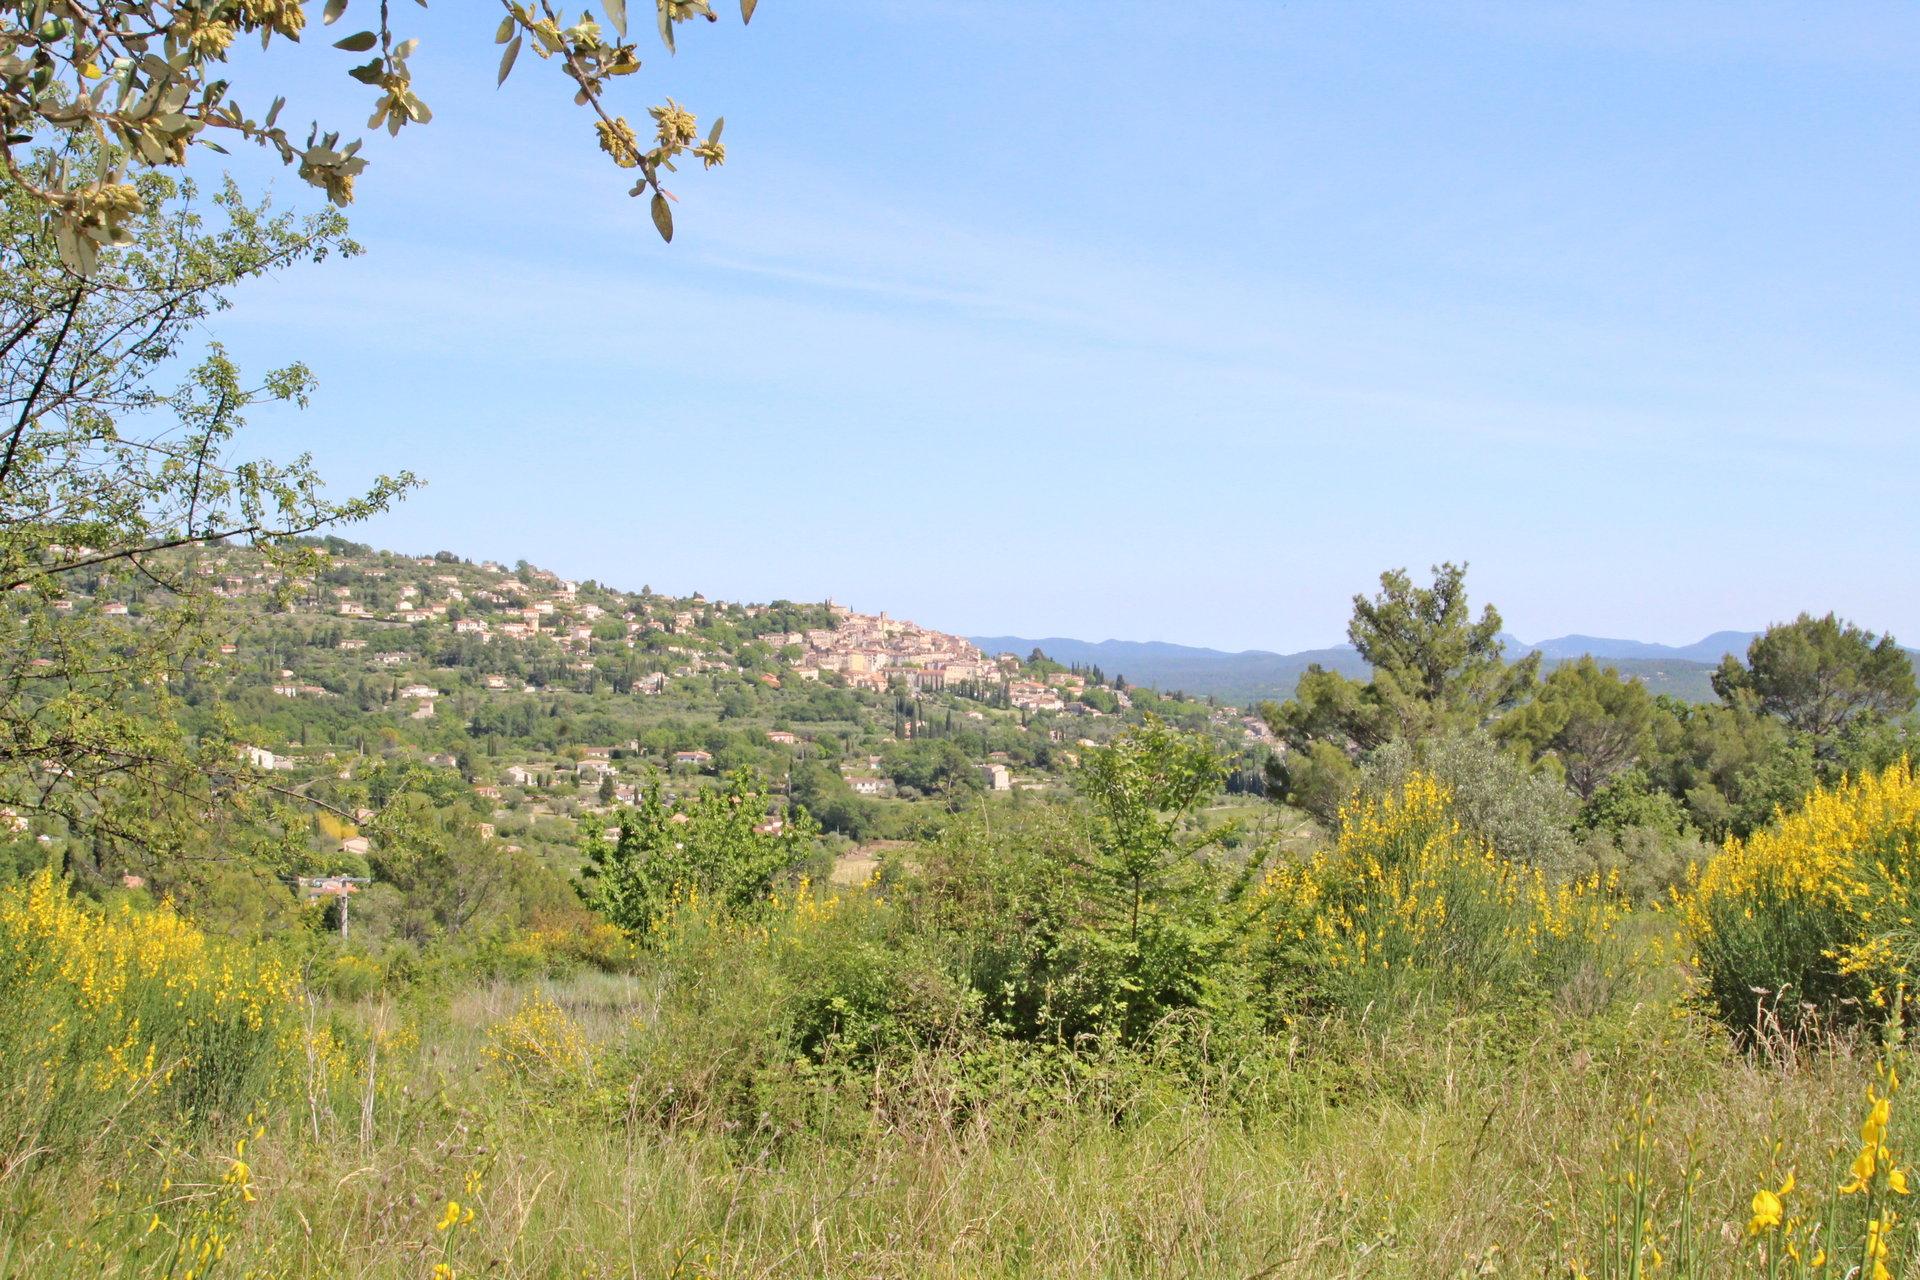 Fayence: Stunning vieuw, location for nature lovers